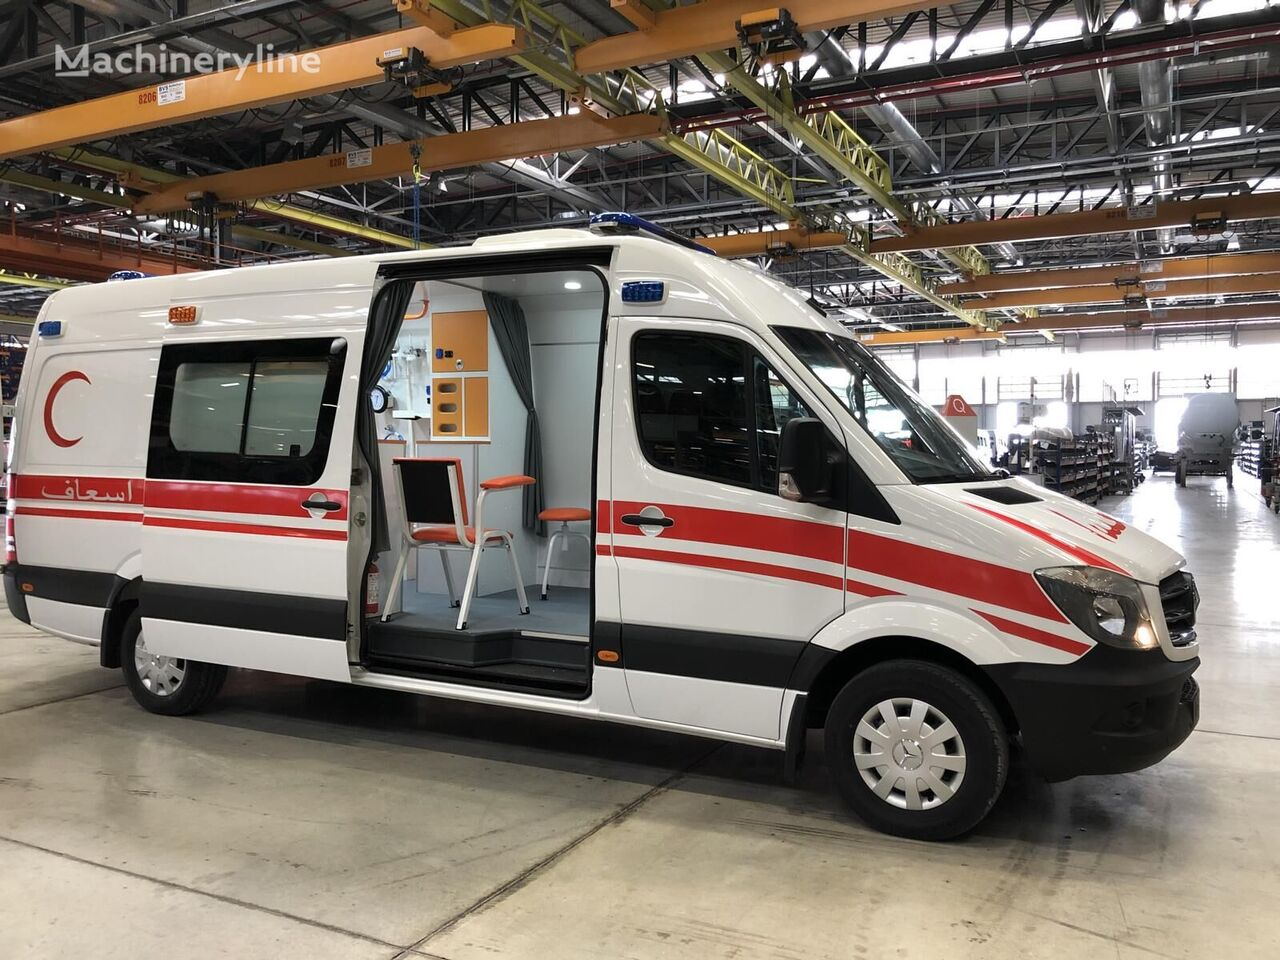 ambulance MERCEDES-BENZ Sprinter 316 CDI neuve